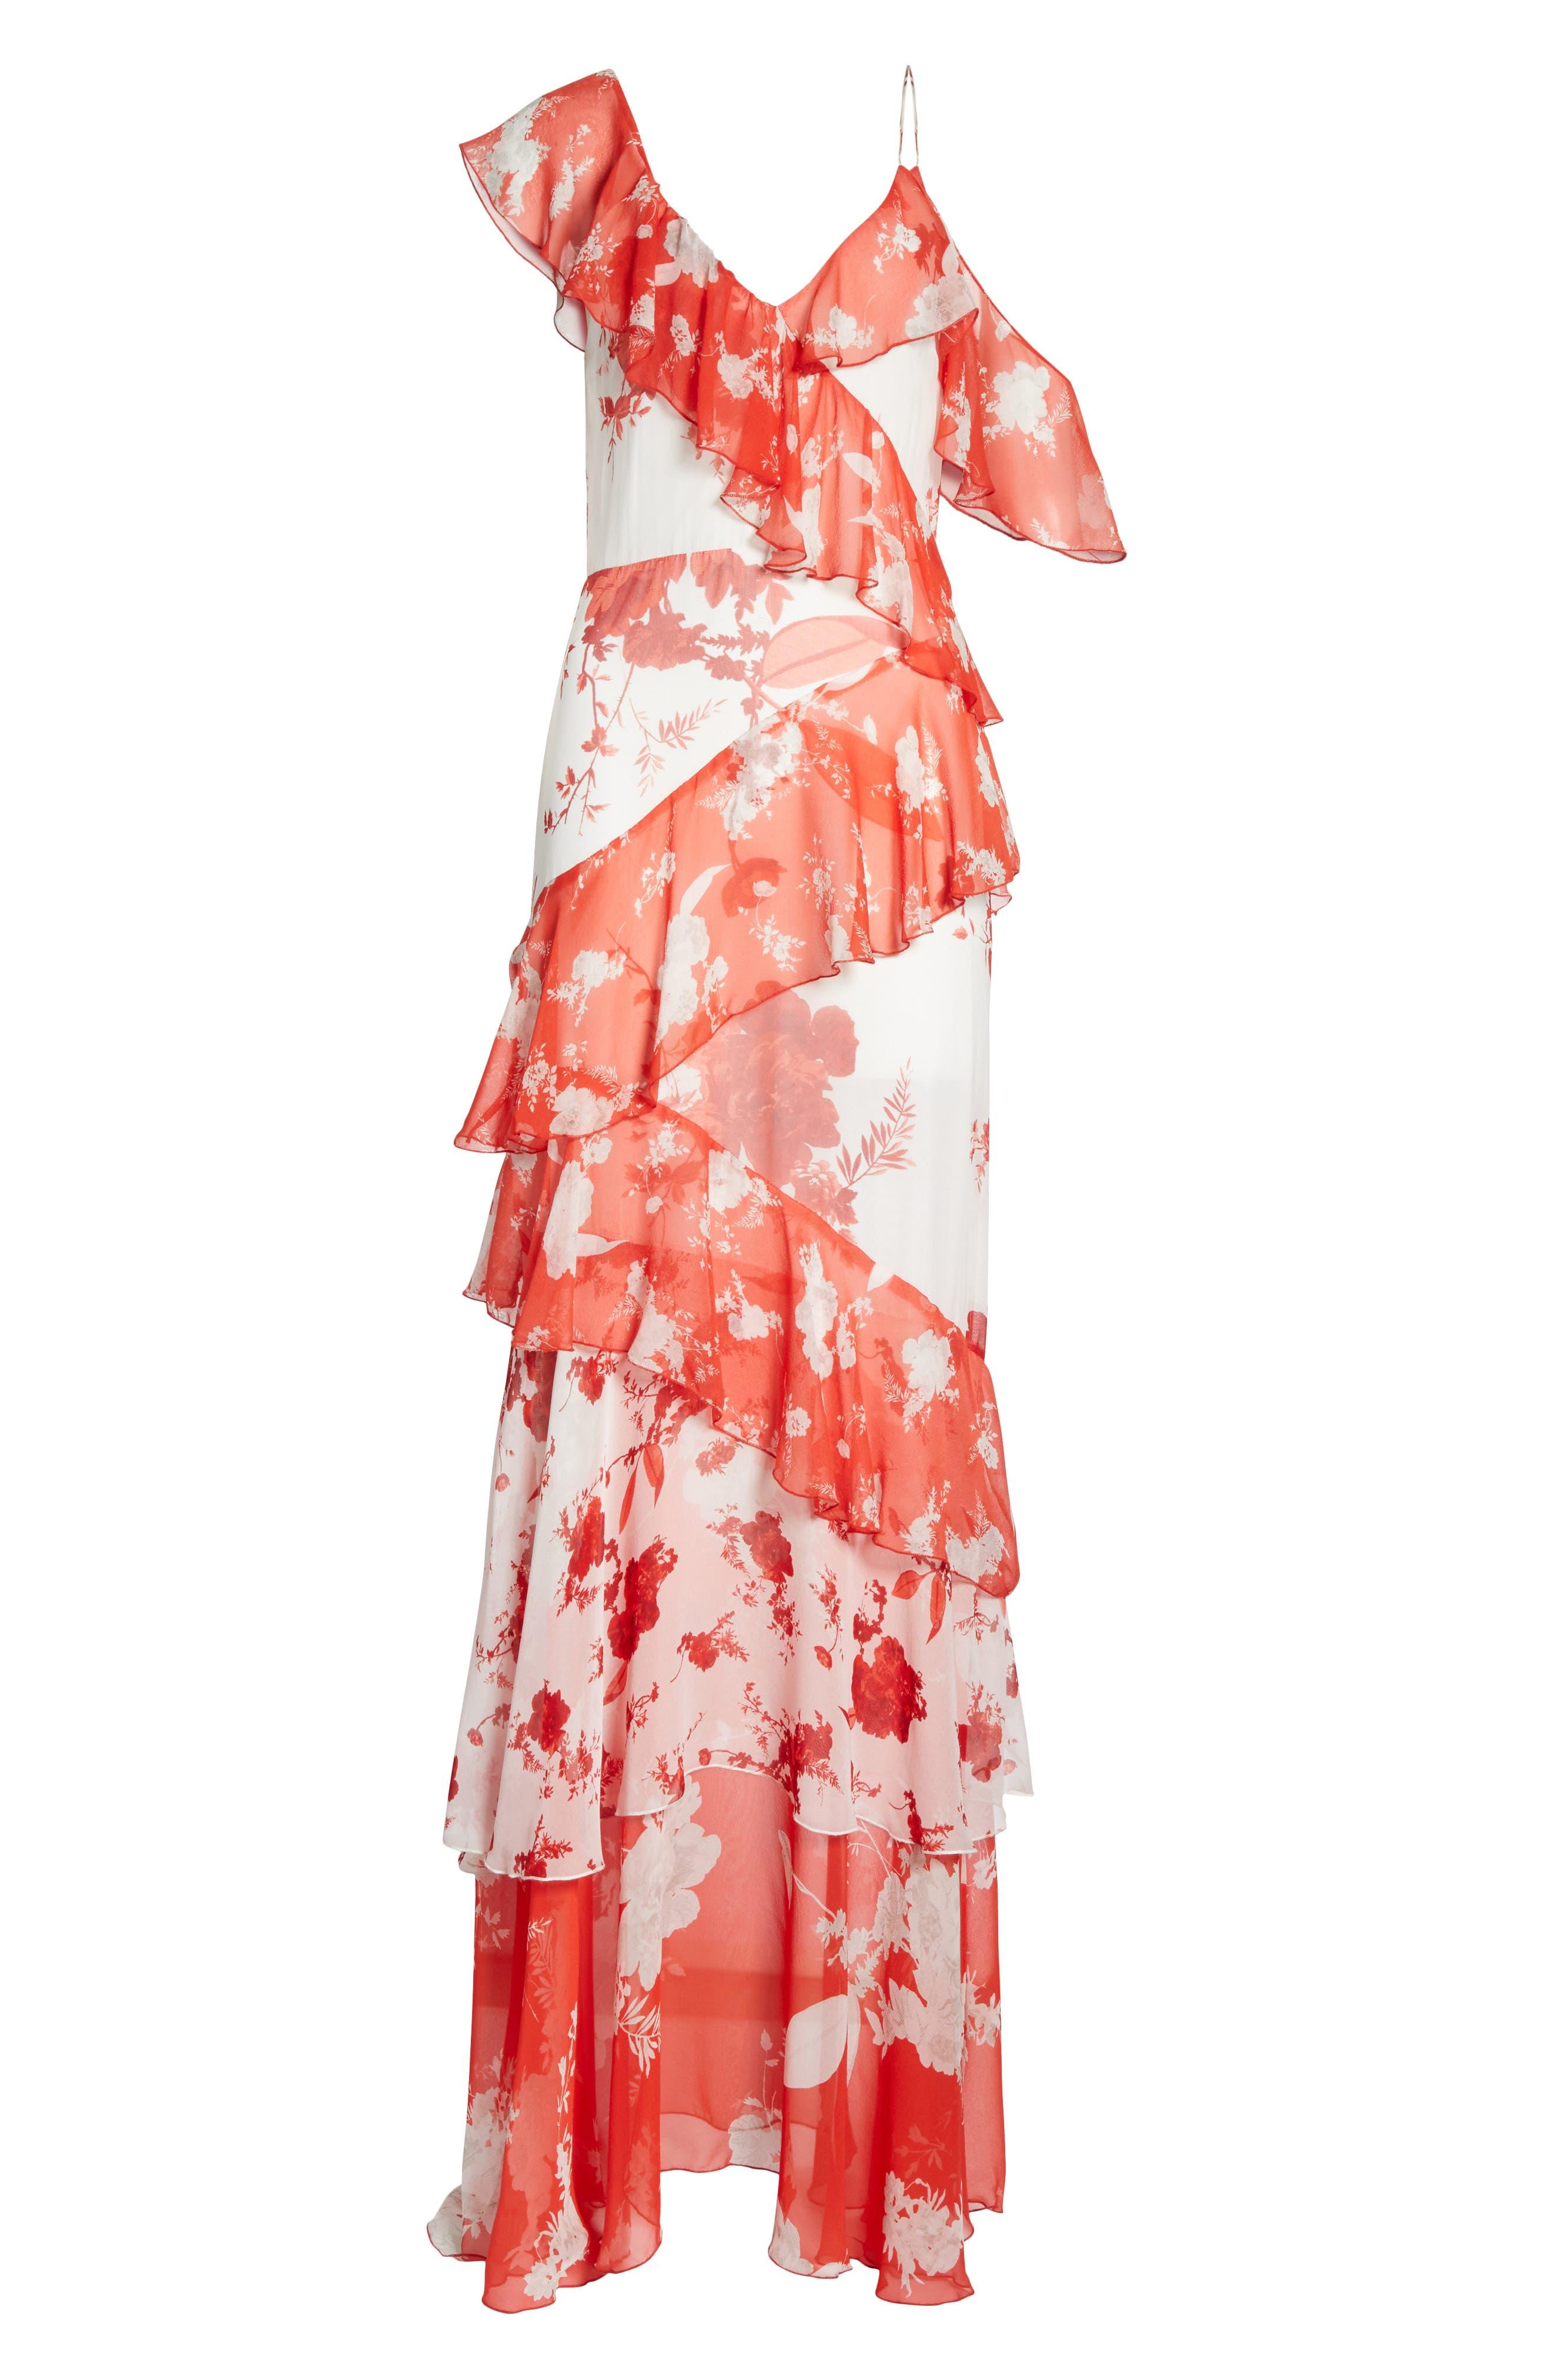 Olympia Asymmetrical Silk Maxi Dress,                             Alternate thumbnail 6, color,                             Damask Rose- Soft White